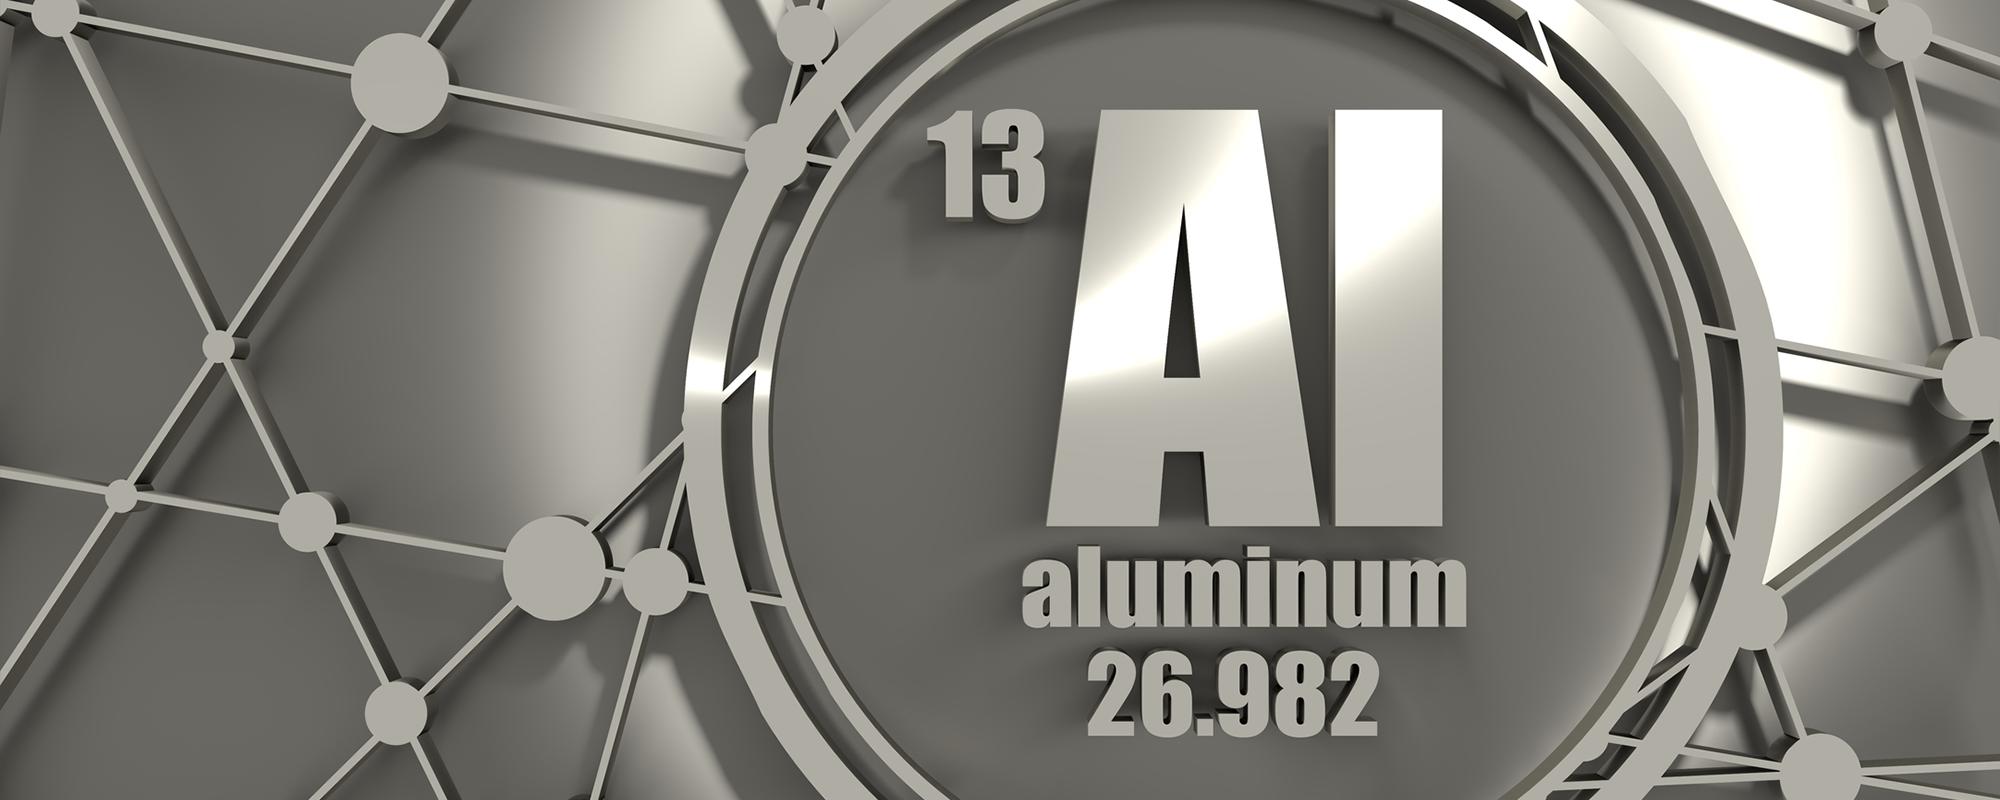 Hero_2000X800_AluminumAtomicWeight